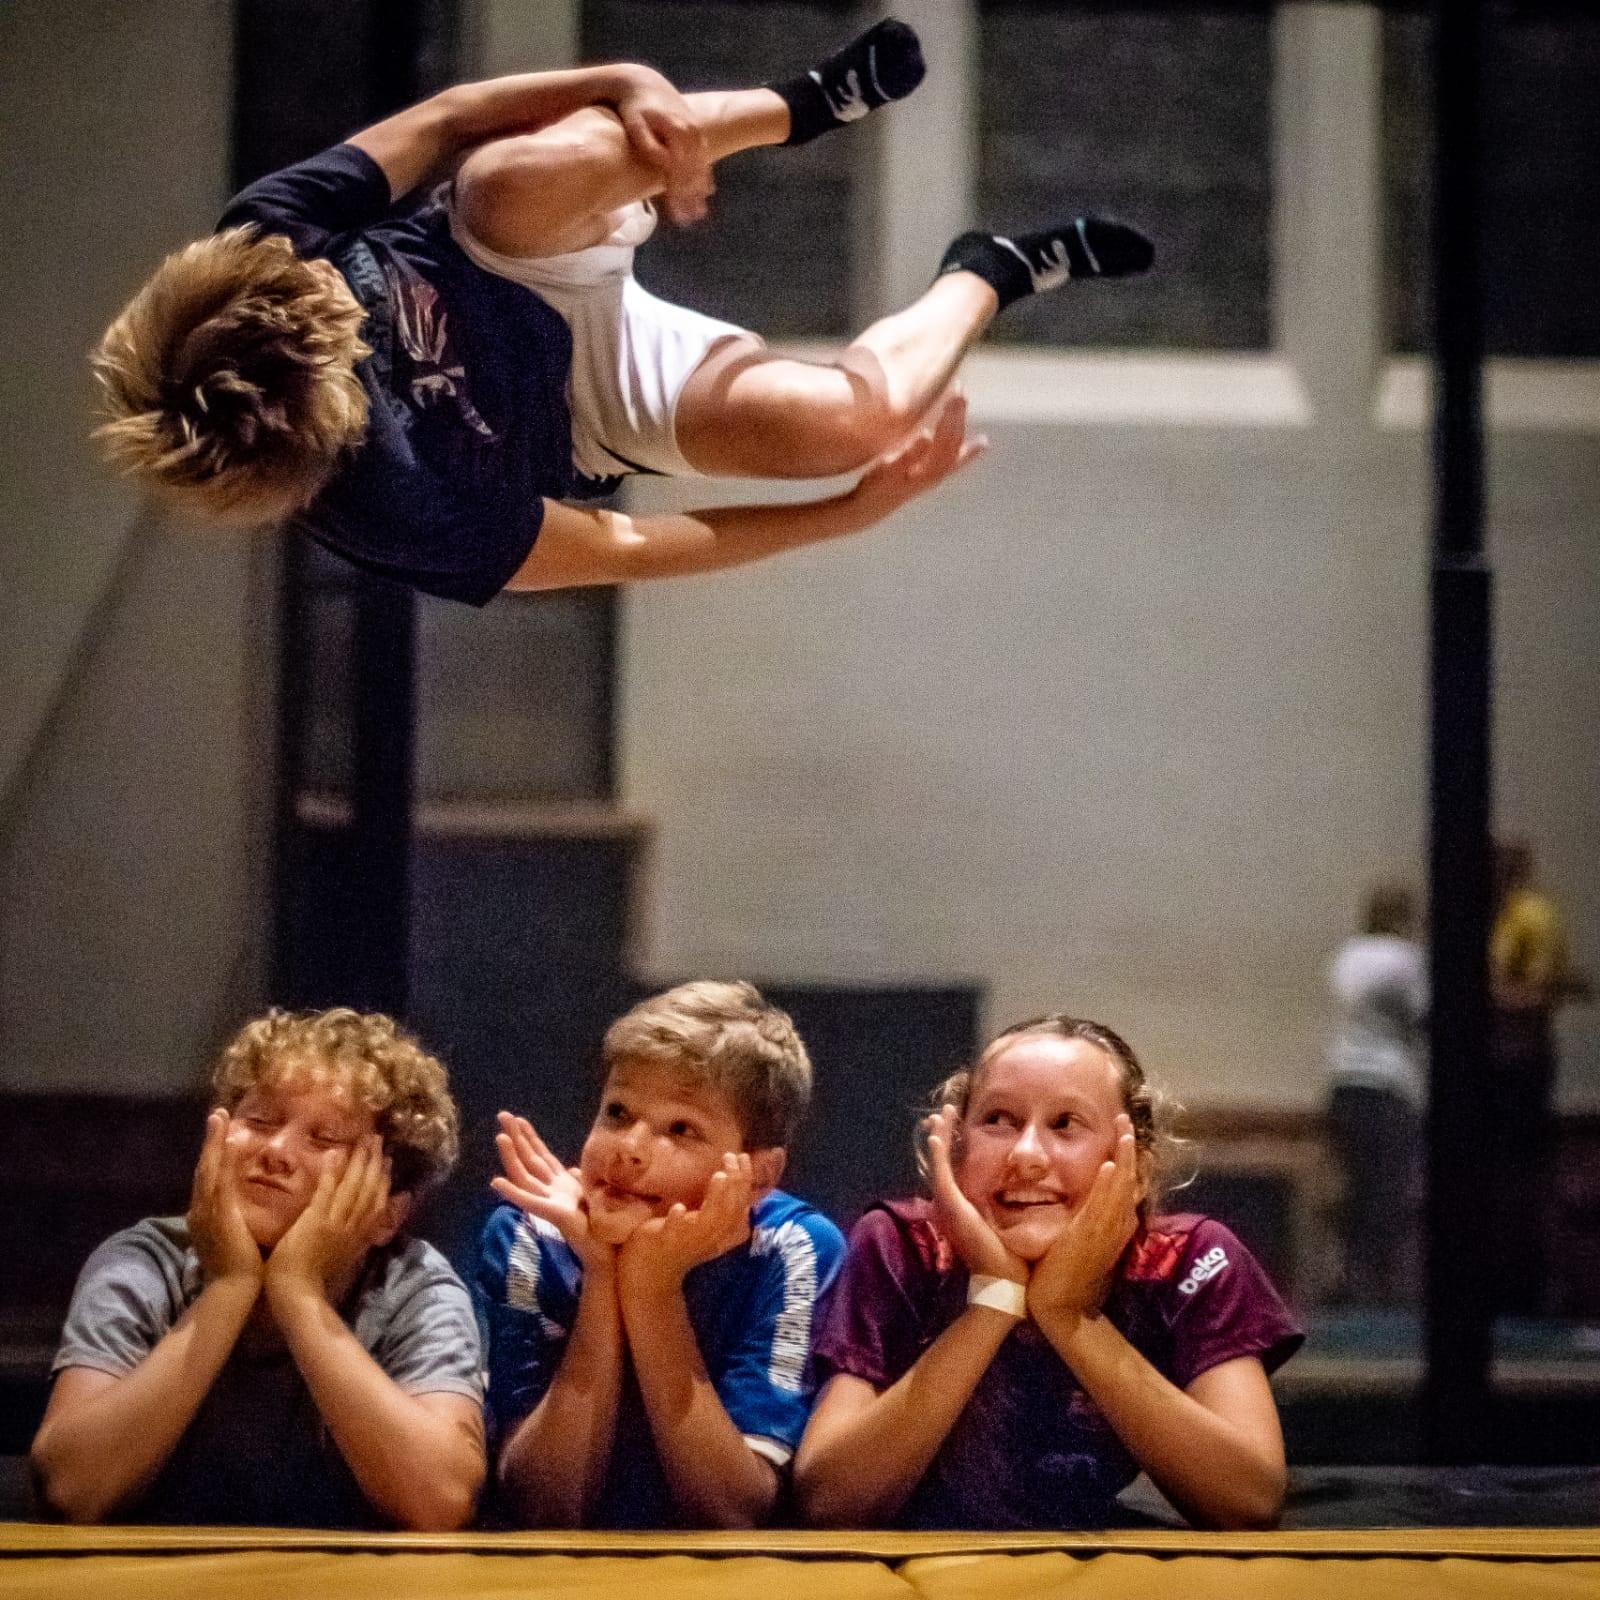 Flight Deck Academy Trampolinepark Jumples